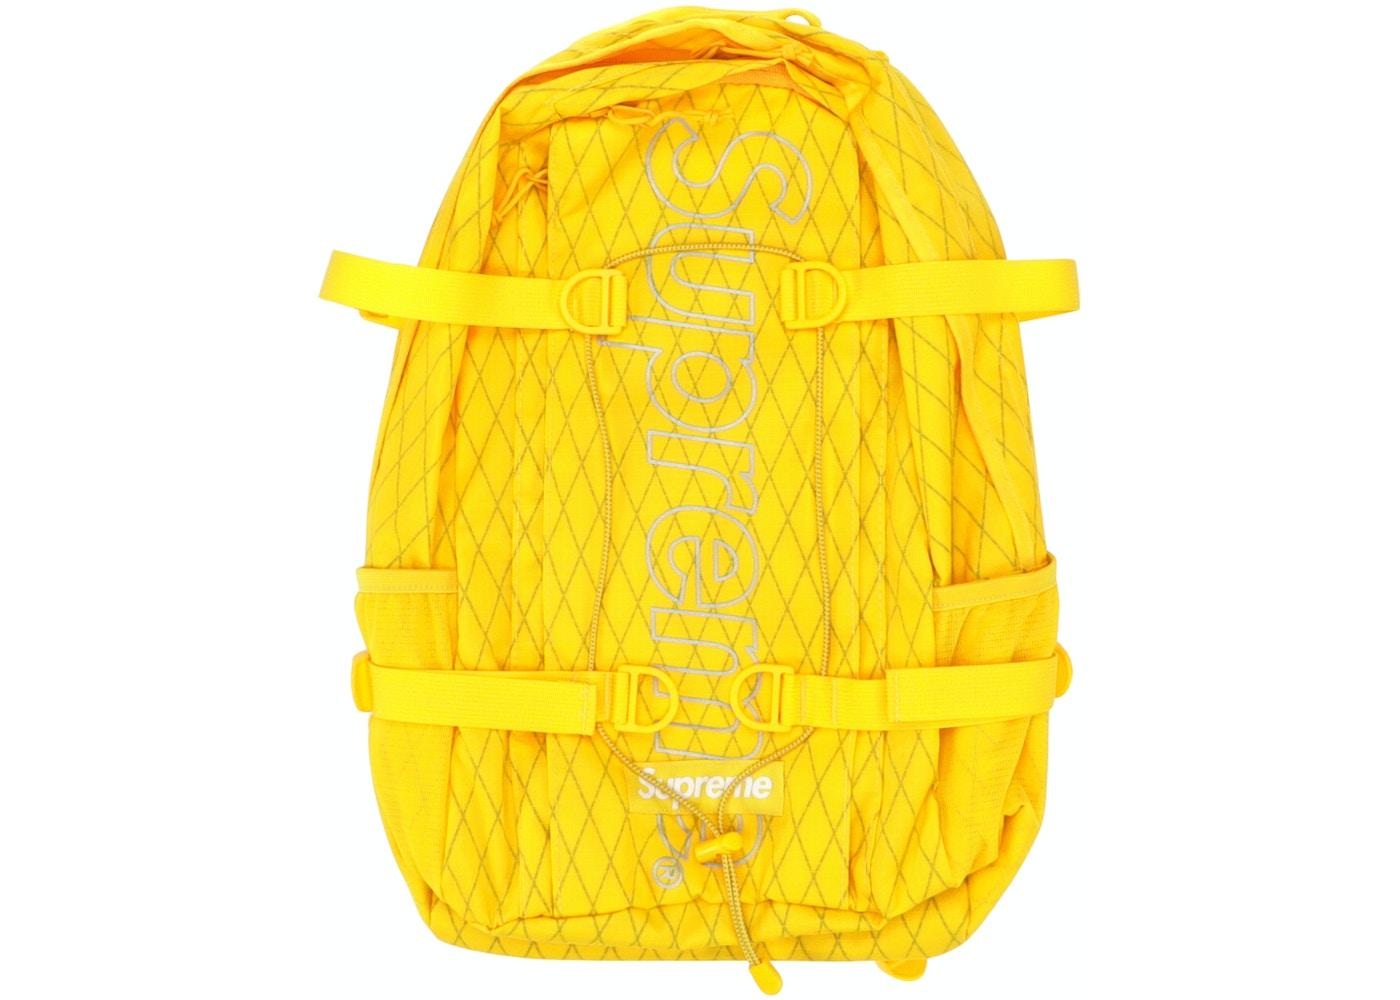 665237c71 Supreme Backpack (FW18) Yellow - FW18